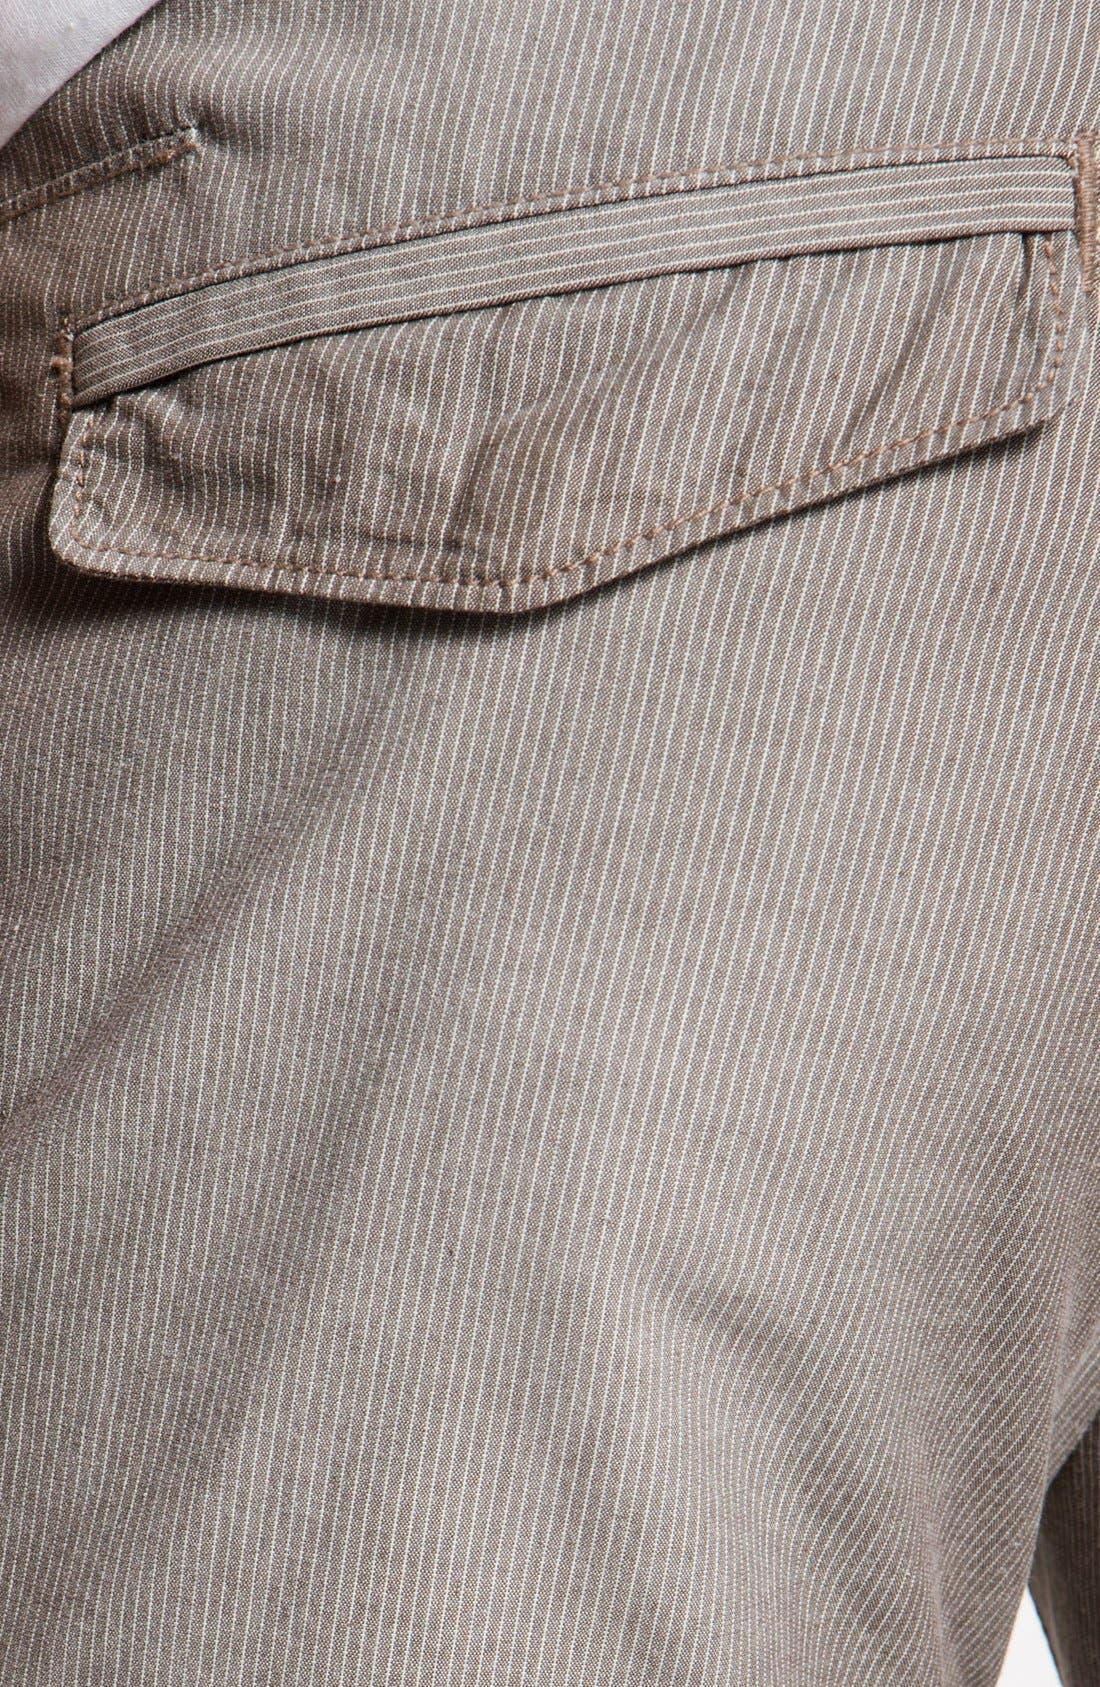 Alternate Image 3  - BOSS Orange 'Sairy' Slim Straight Leg Chinos